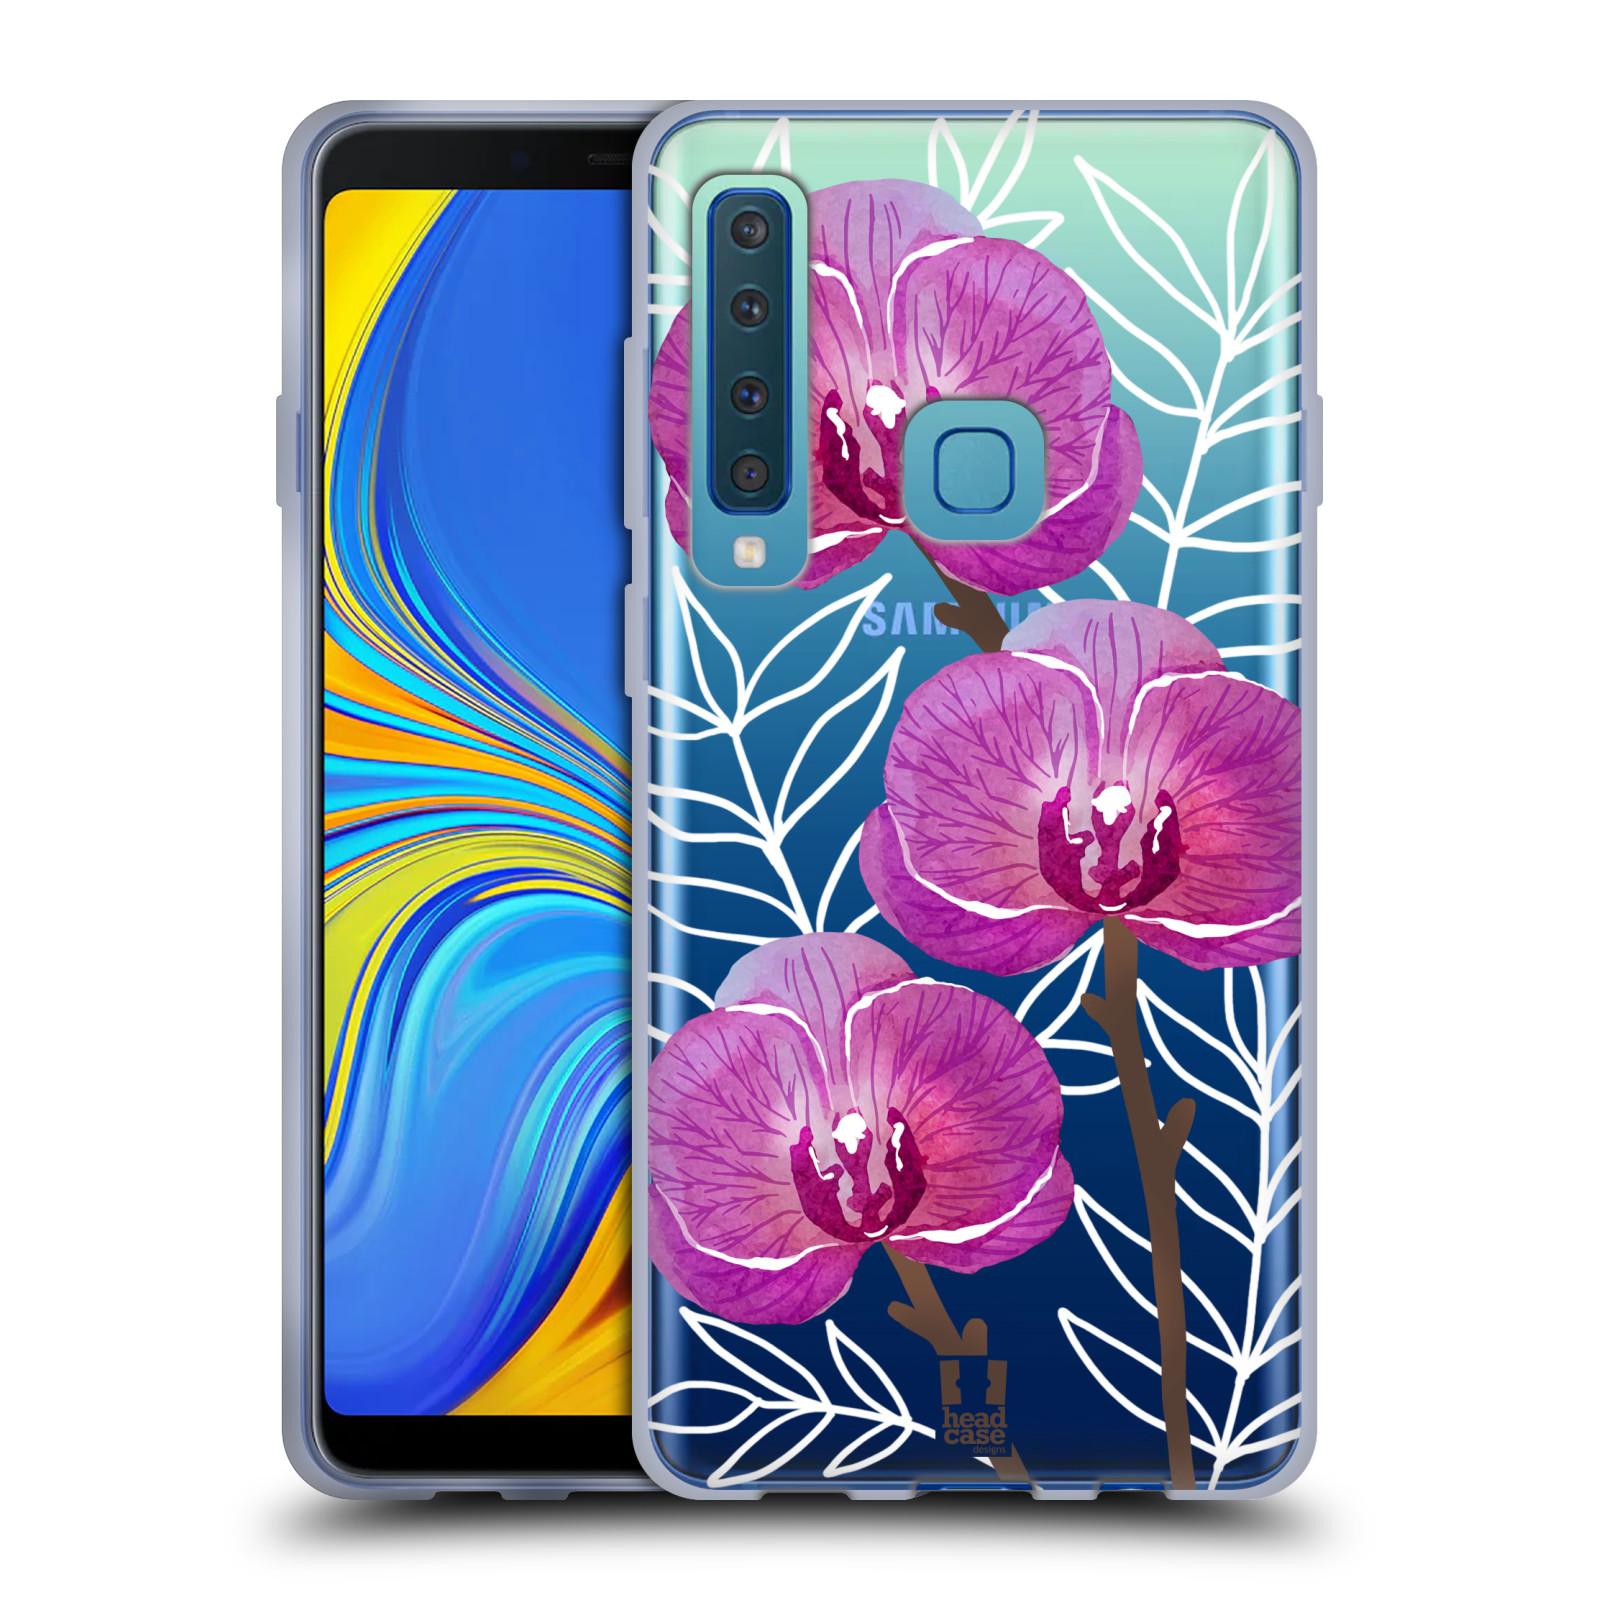 Silikonové pouzdro na mobil Samsung Galaxy A9 (2018) - Head Case - Hezoučké kvítky - průhledné